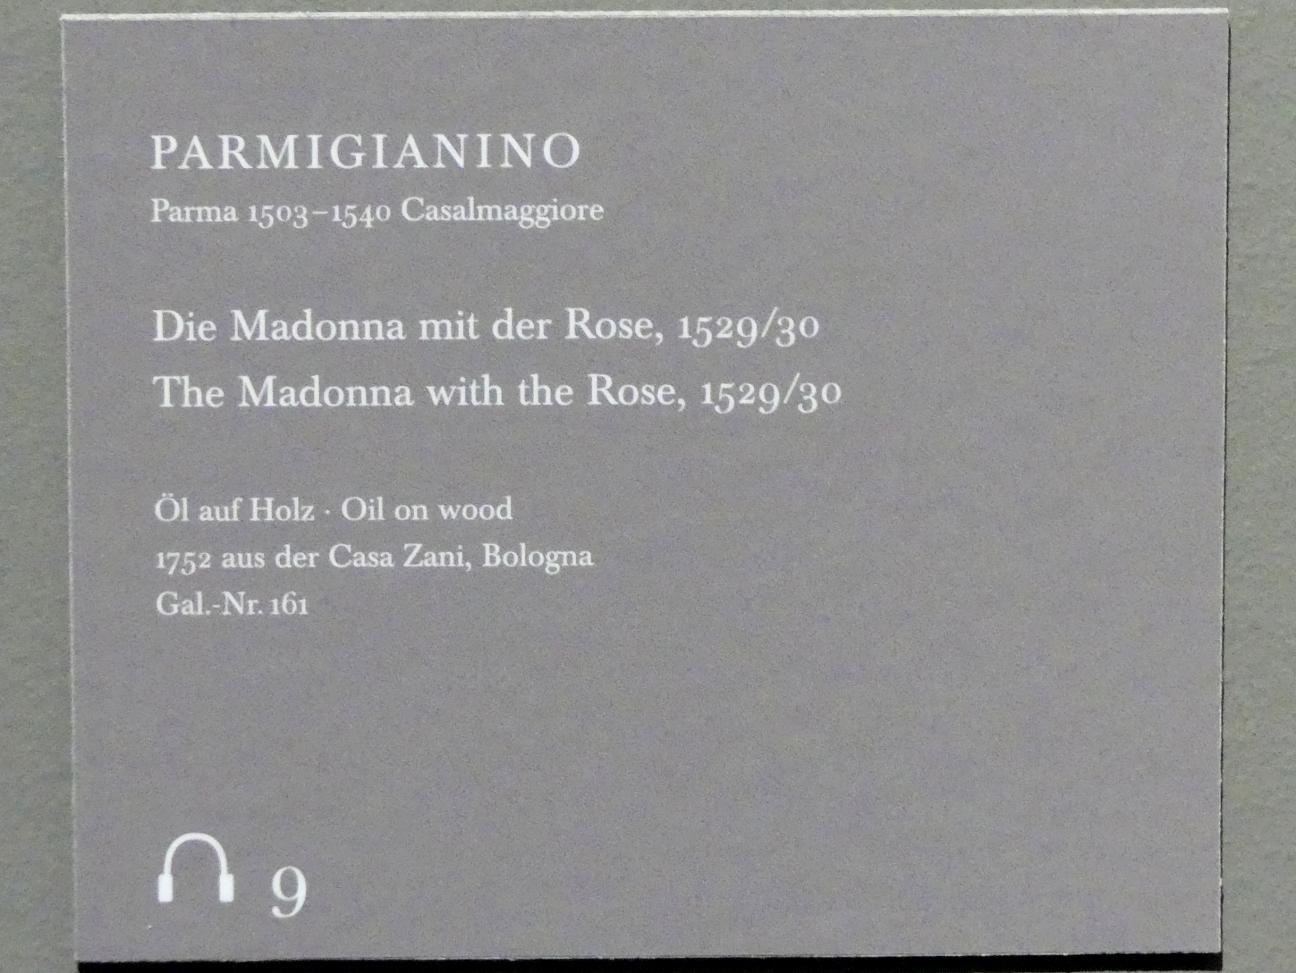 Parmigianino (Girolamo Francesco Maria Mazzola): Die Madonna mit der Rose, 1529 - 1530